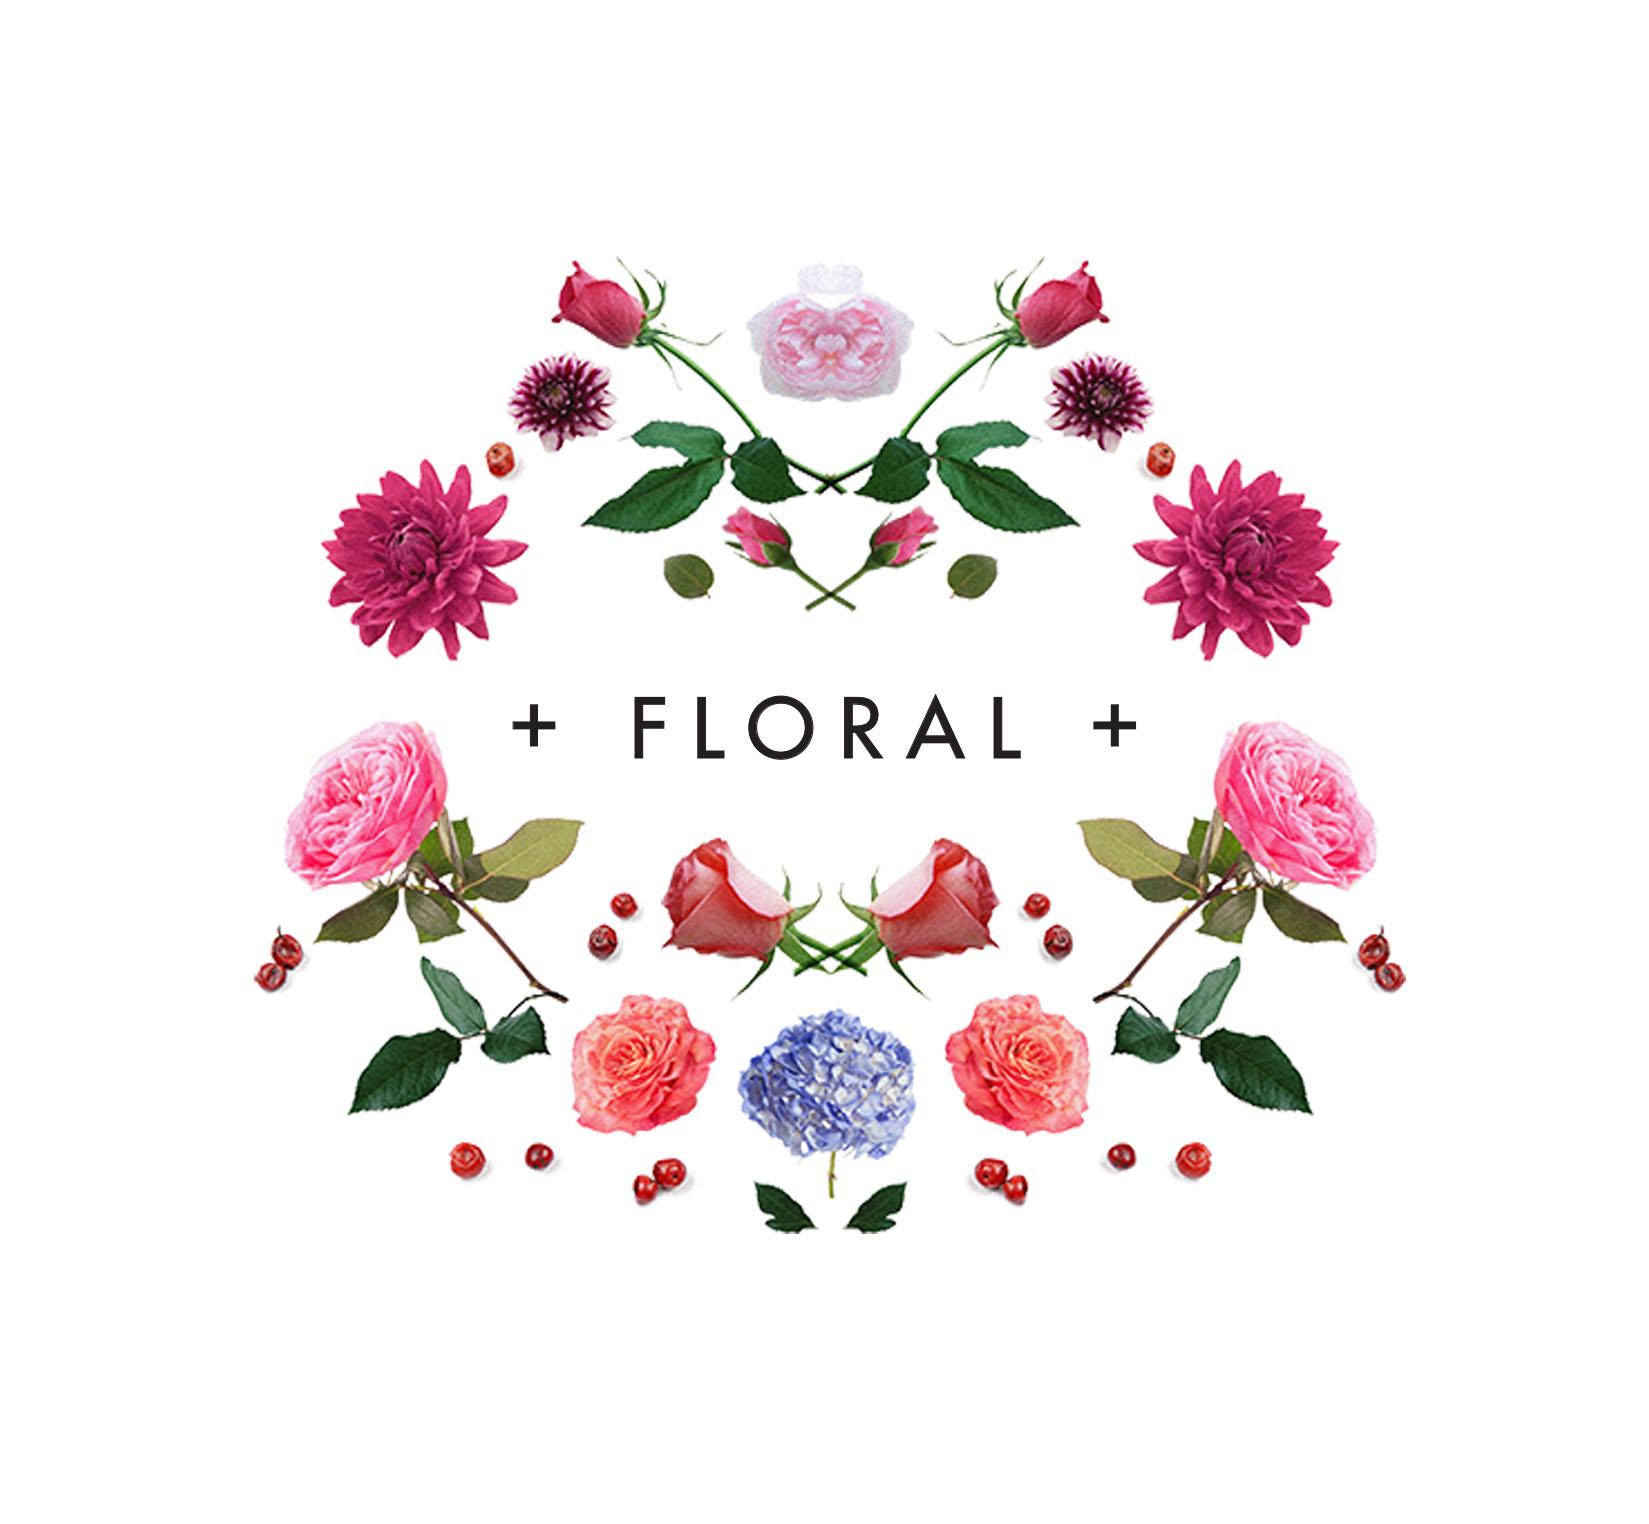 Floral_Range_Motif.jpg